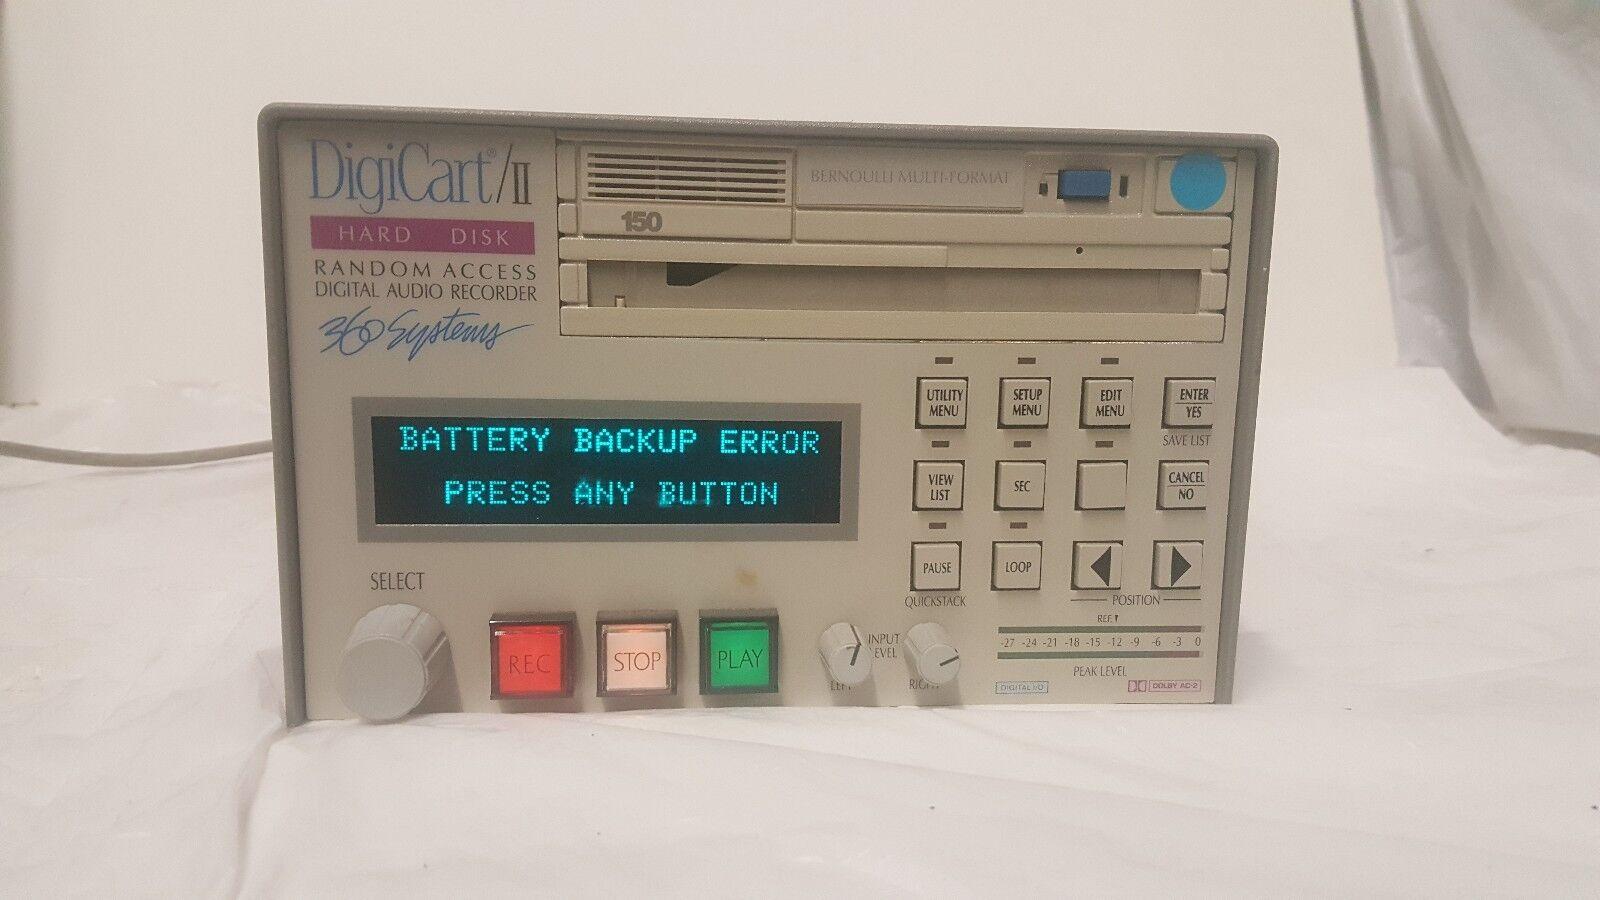 360 Systems Digicart II  Hard Drisk Random Access Digital Audio Recorder